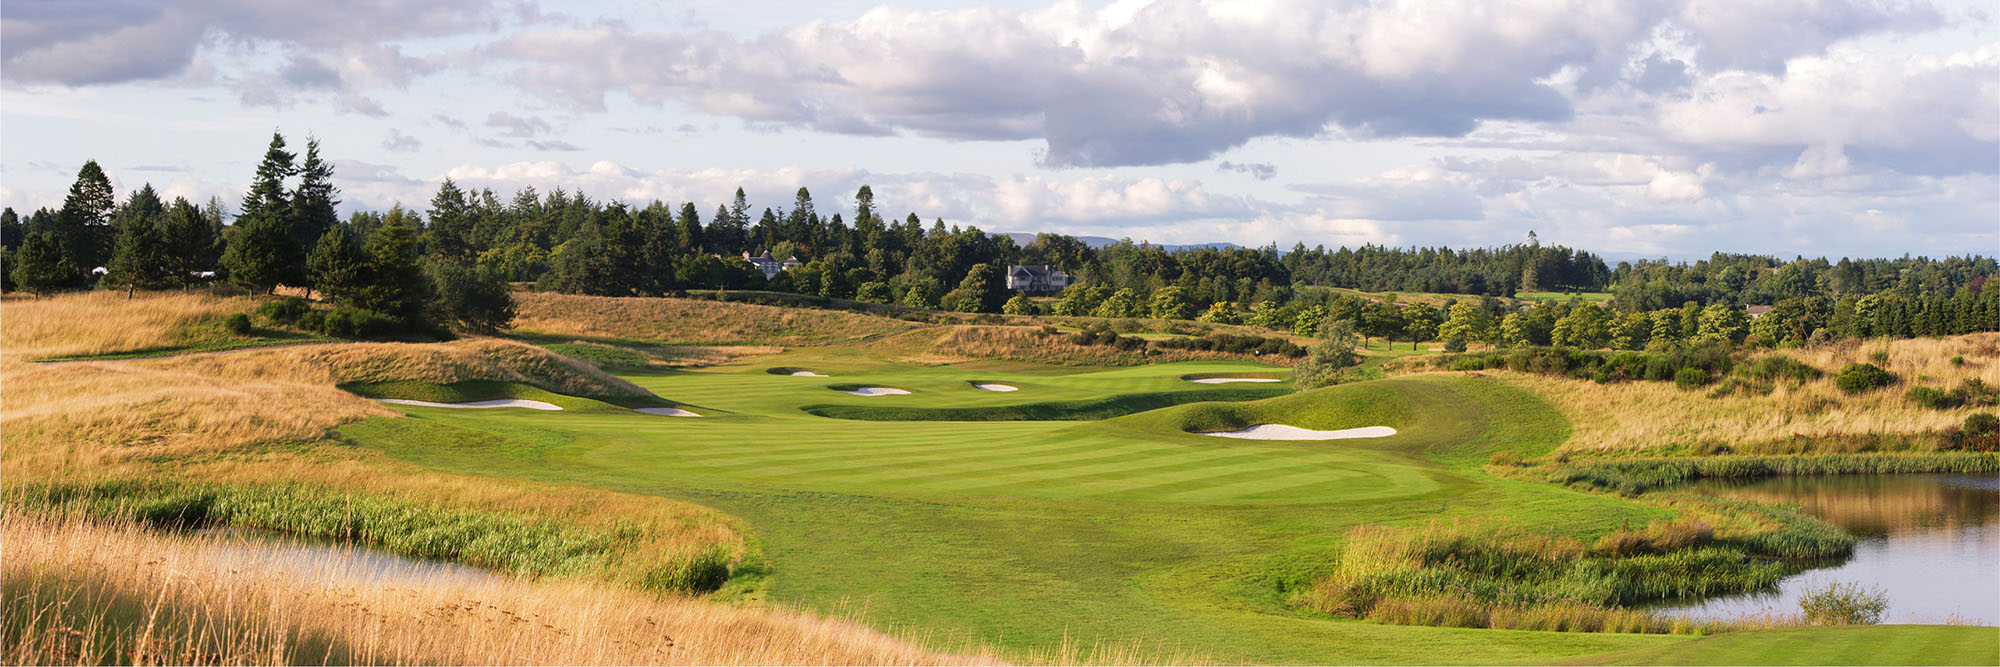 Golf Course Image - Gleneagles PGA Centenary Course No. 9